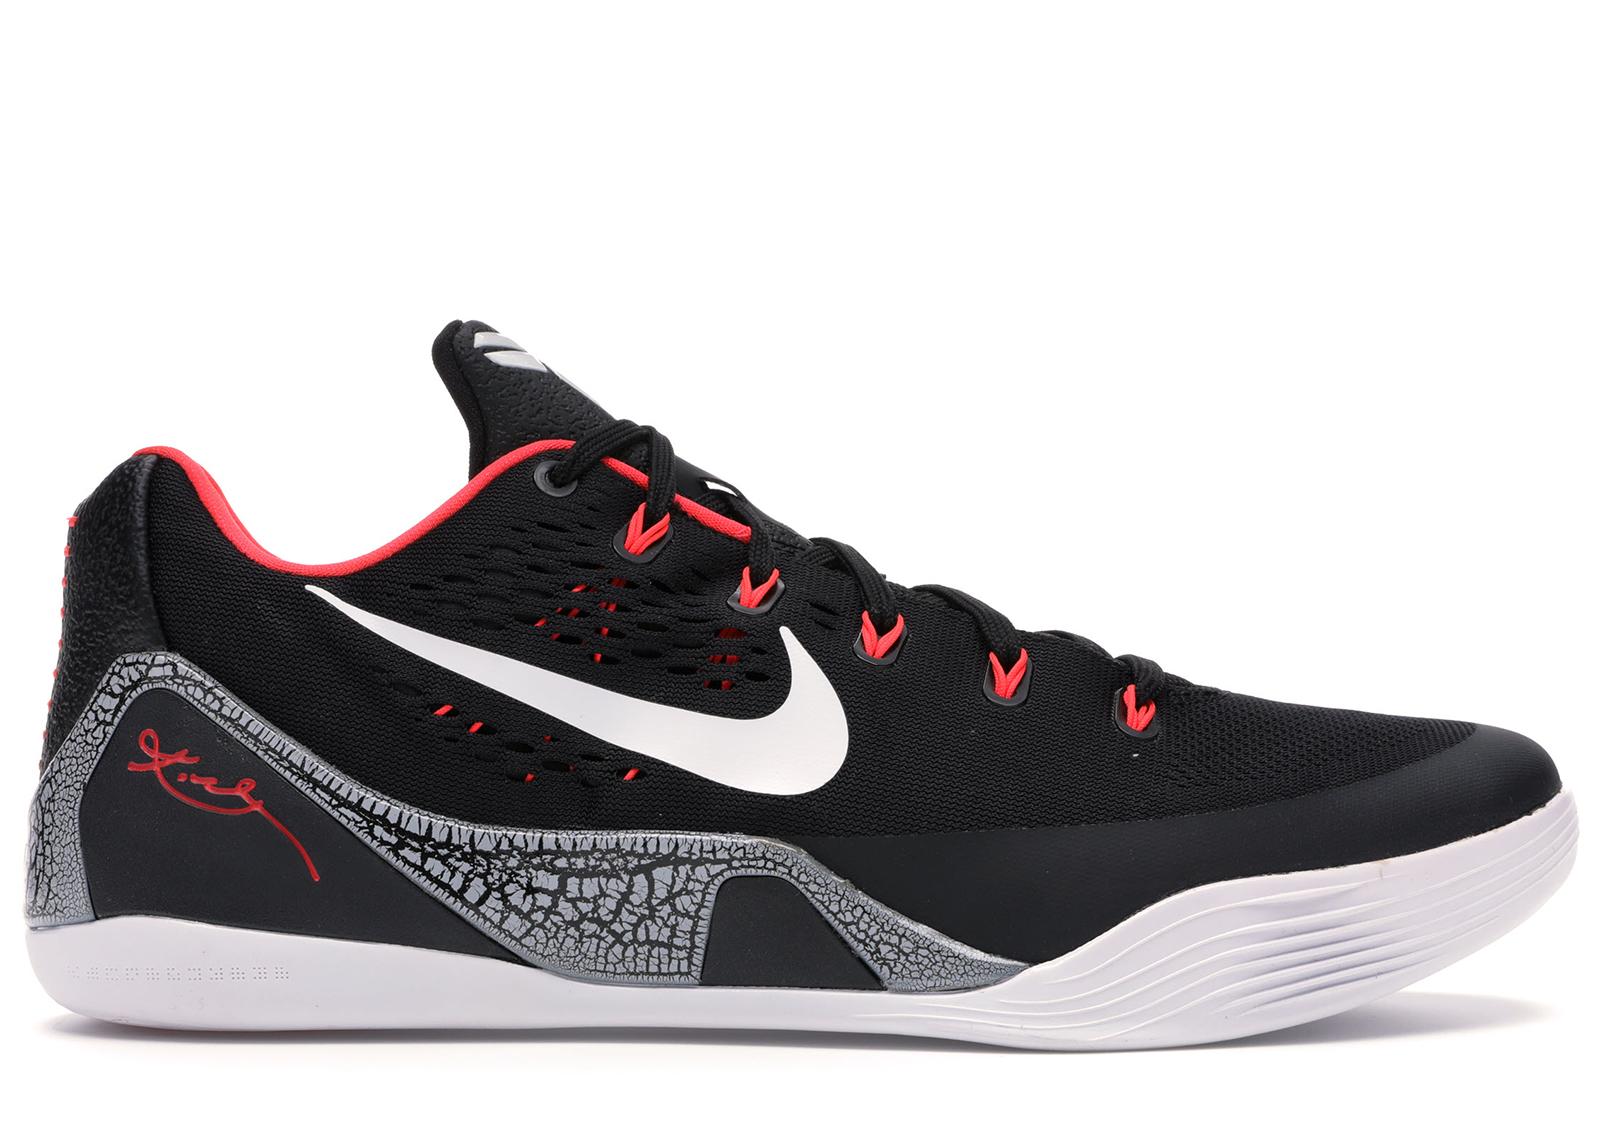 Nike Kobe 9 EM Low Laser Crimson